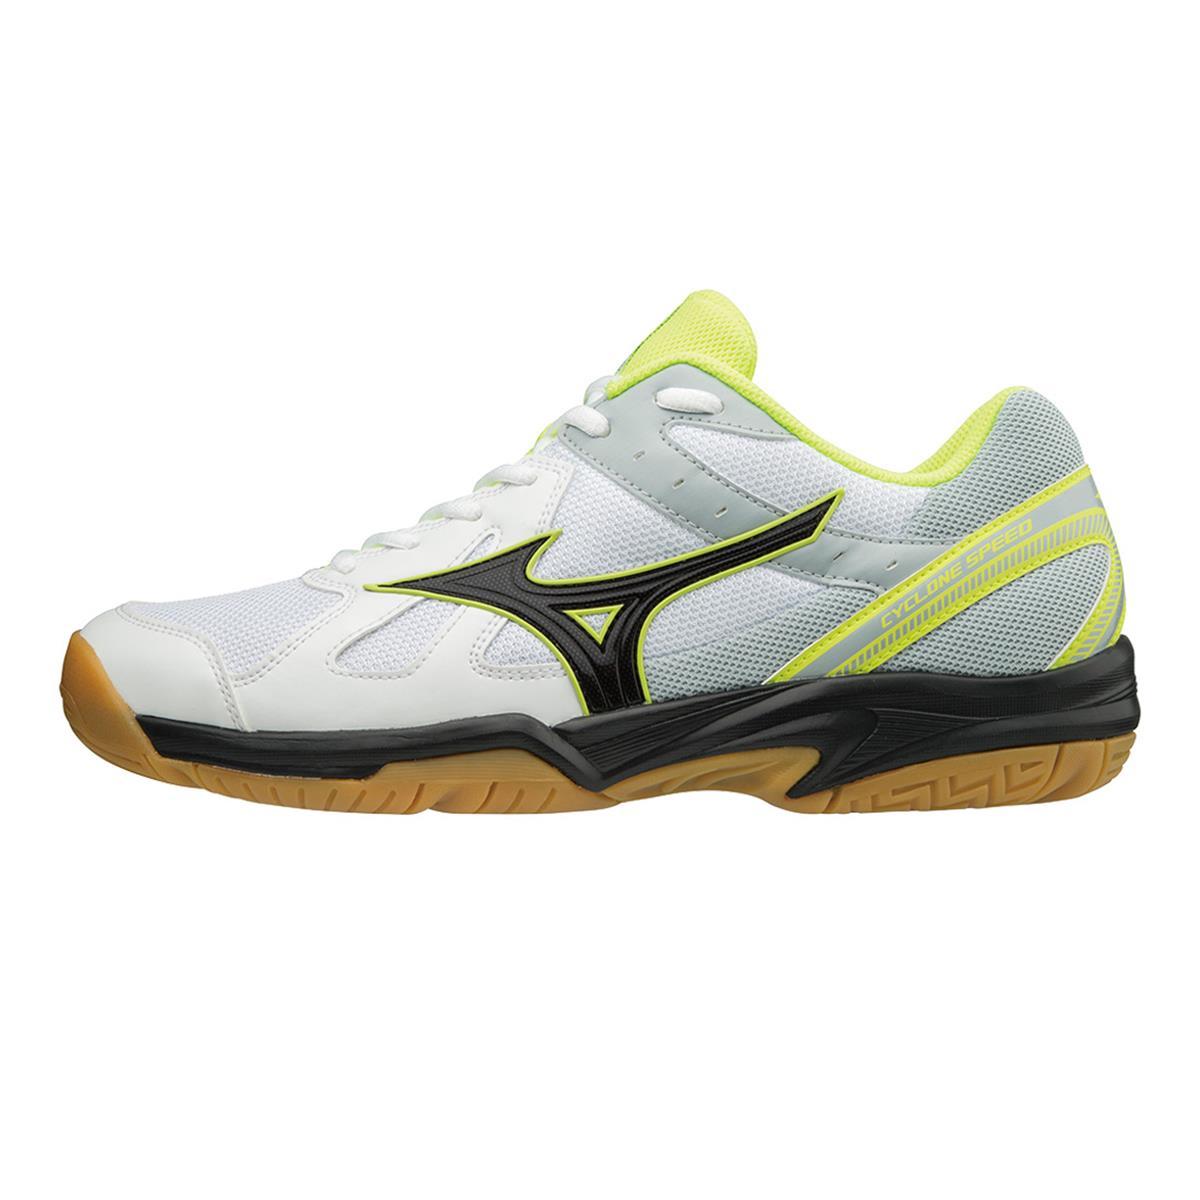 b290e5b90f9f Mizuno Cyclone Speed Mens Court Shoes (White-Black-Safety Yellow ...